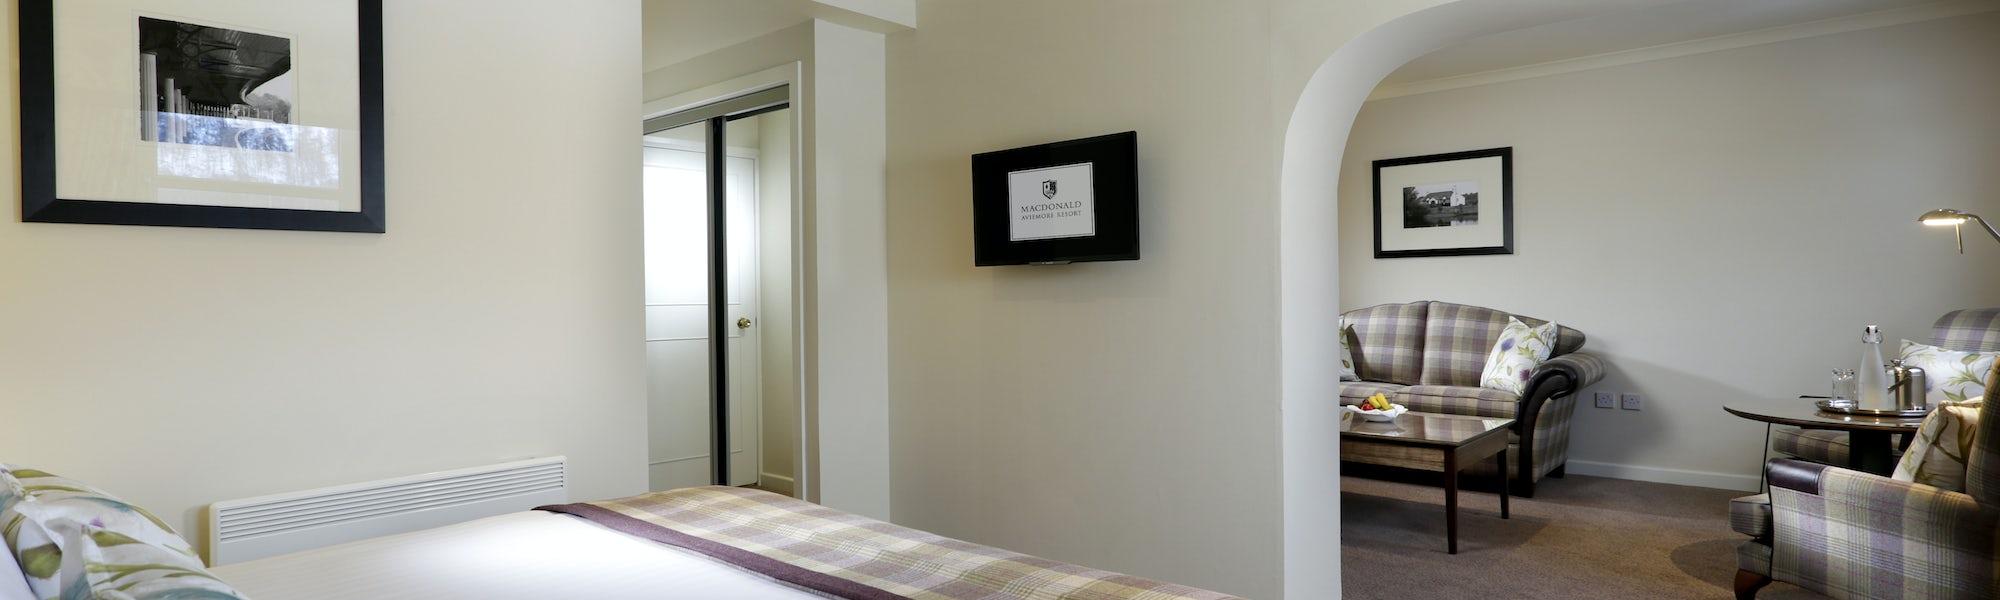 Craigellachie Suite Bedroom, Morlich